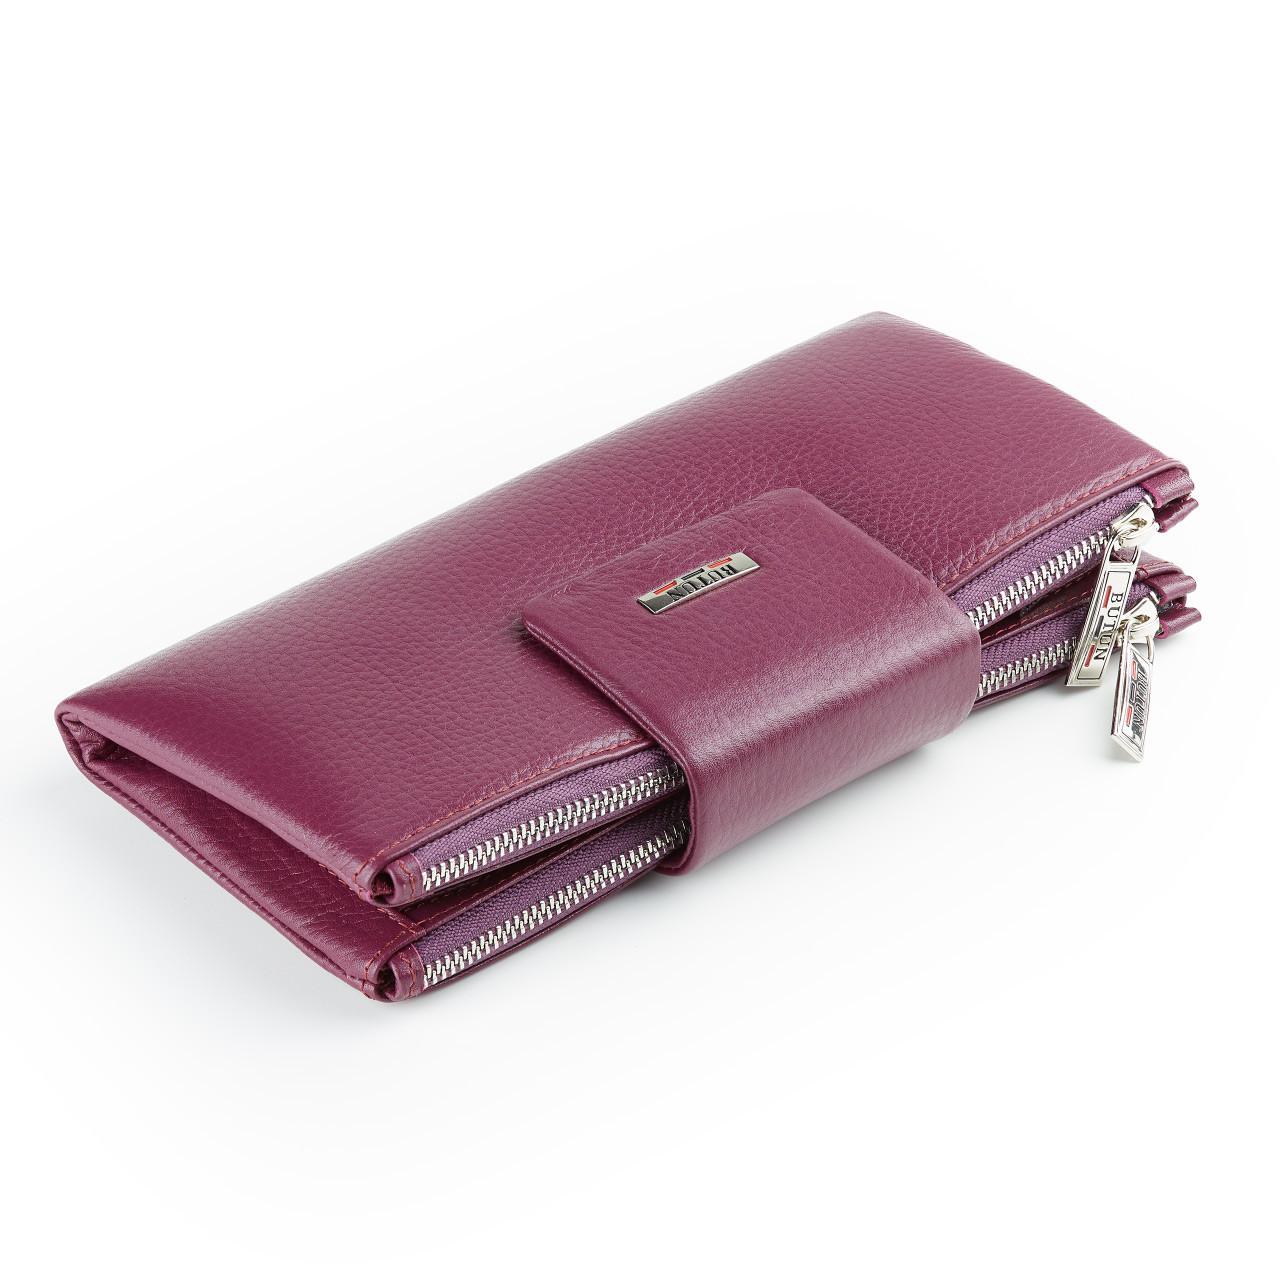 Большой женский кошелек BUTUN 507-004-005 кожаный марсала